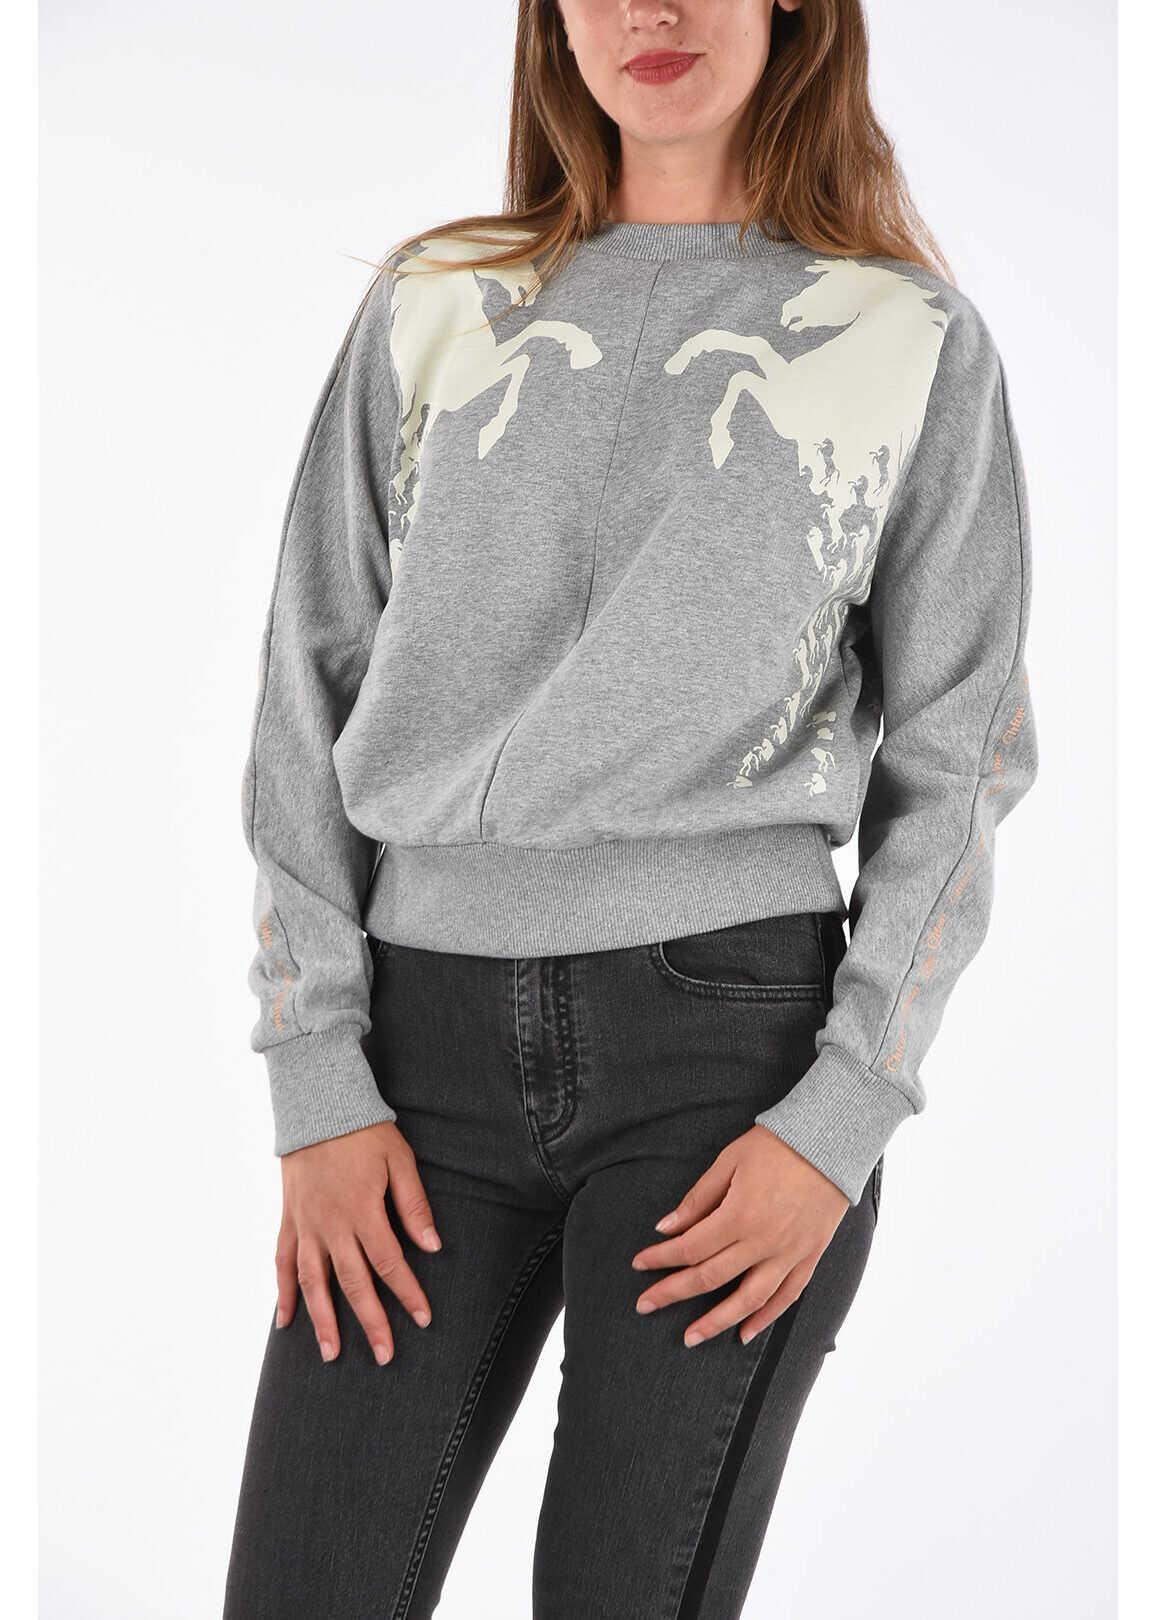 Chloe Crew-Neck Sweatshirt with Print GRAY